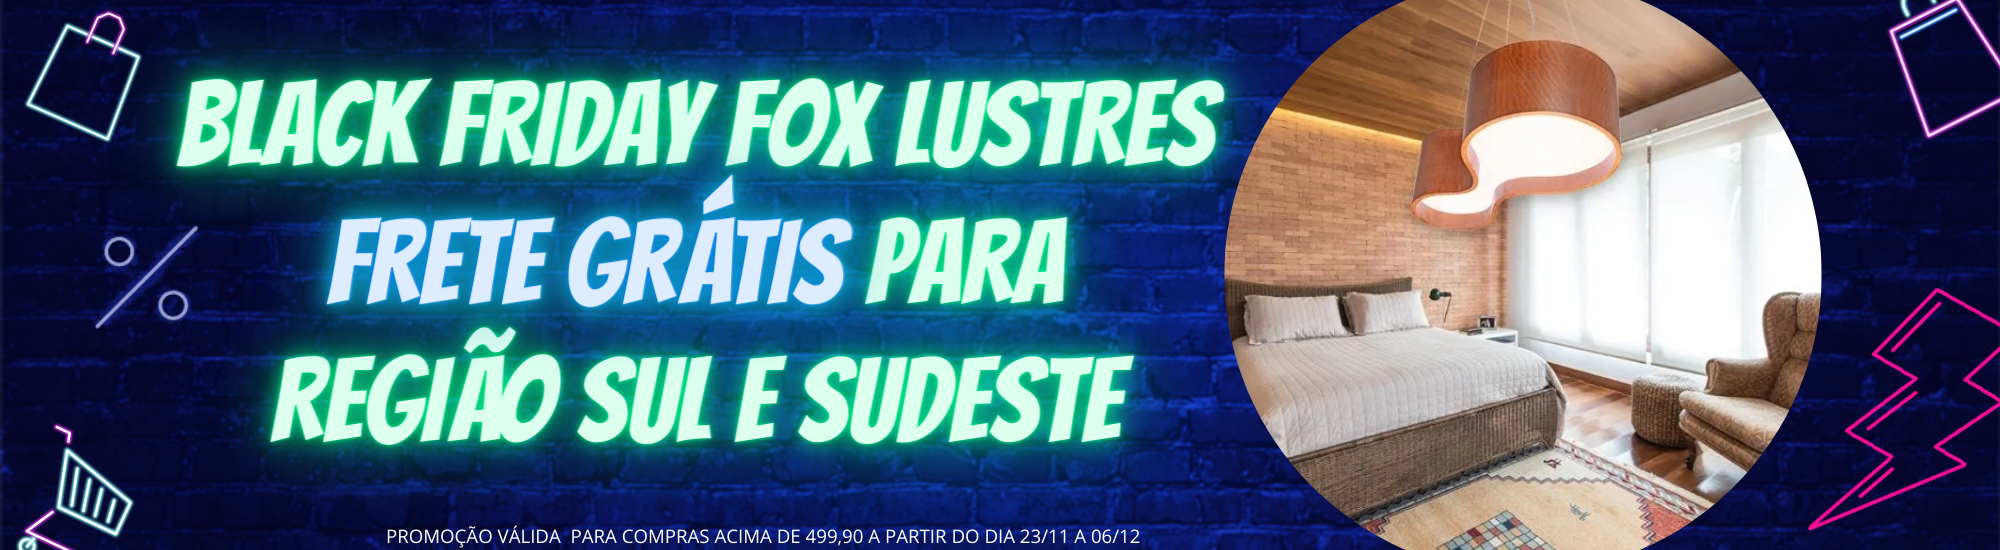 FOX LUSTRES